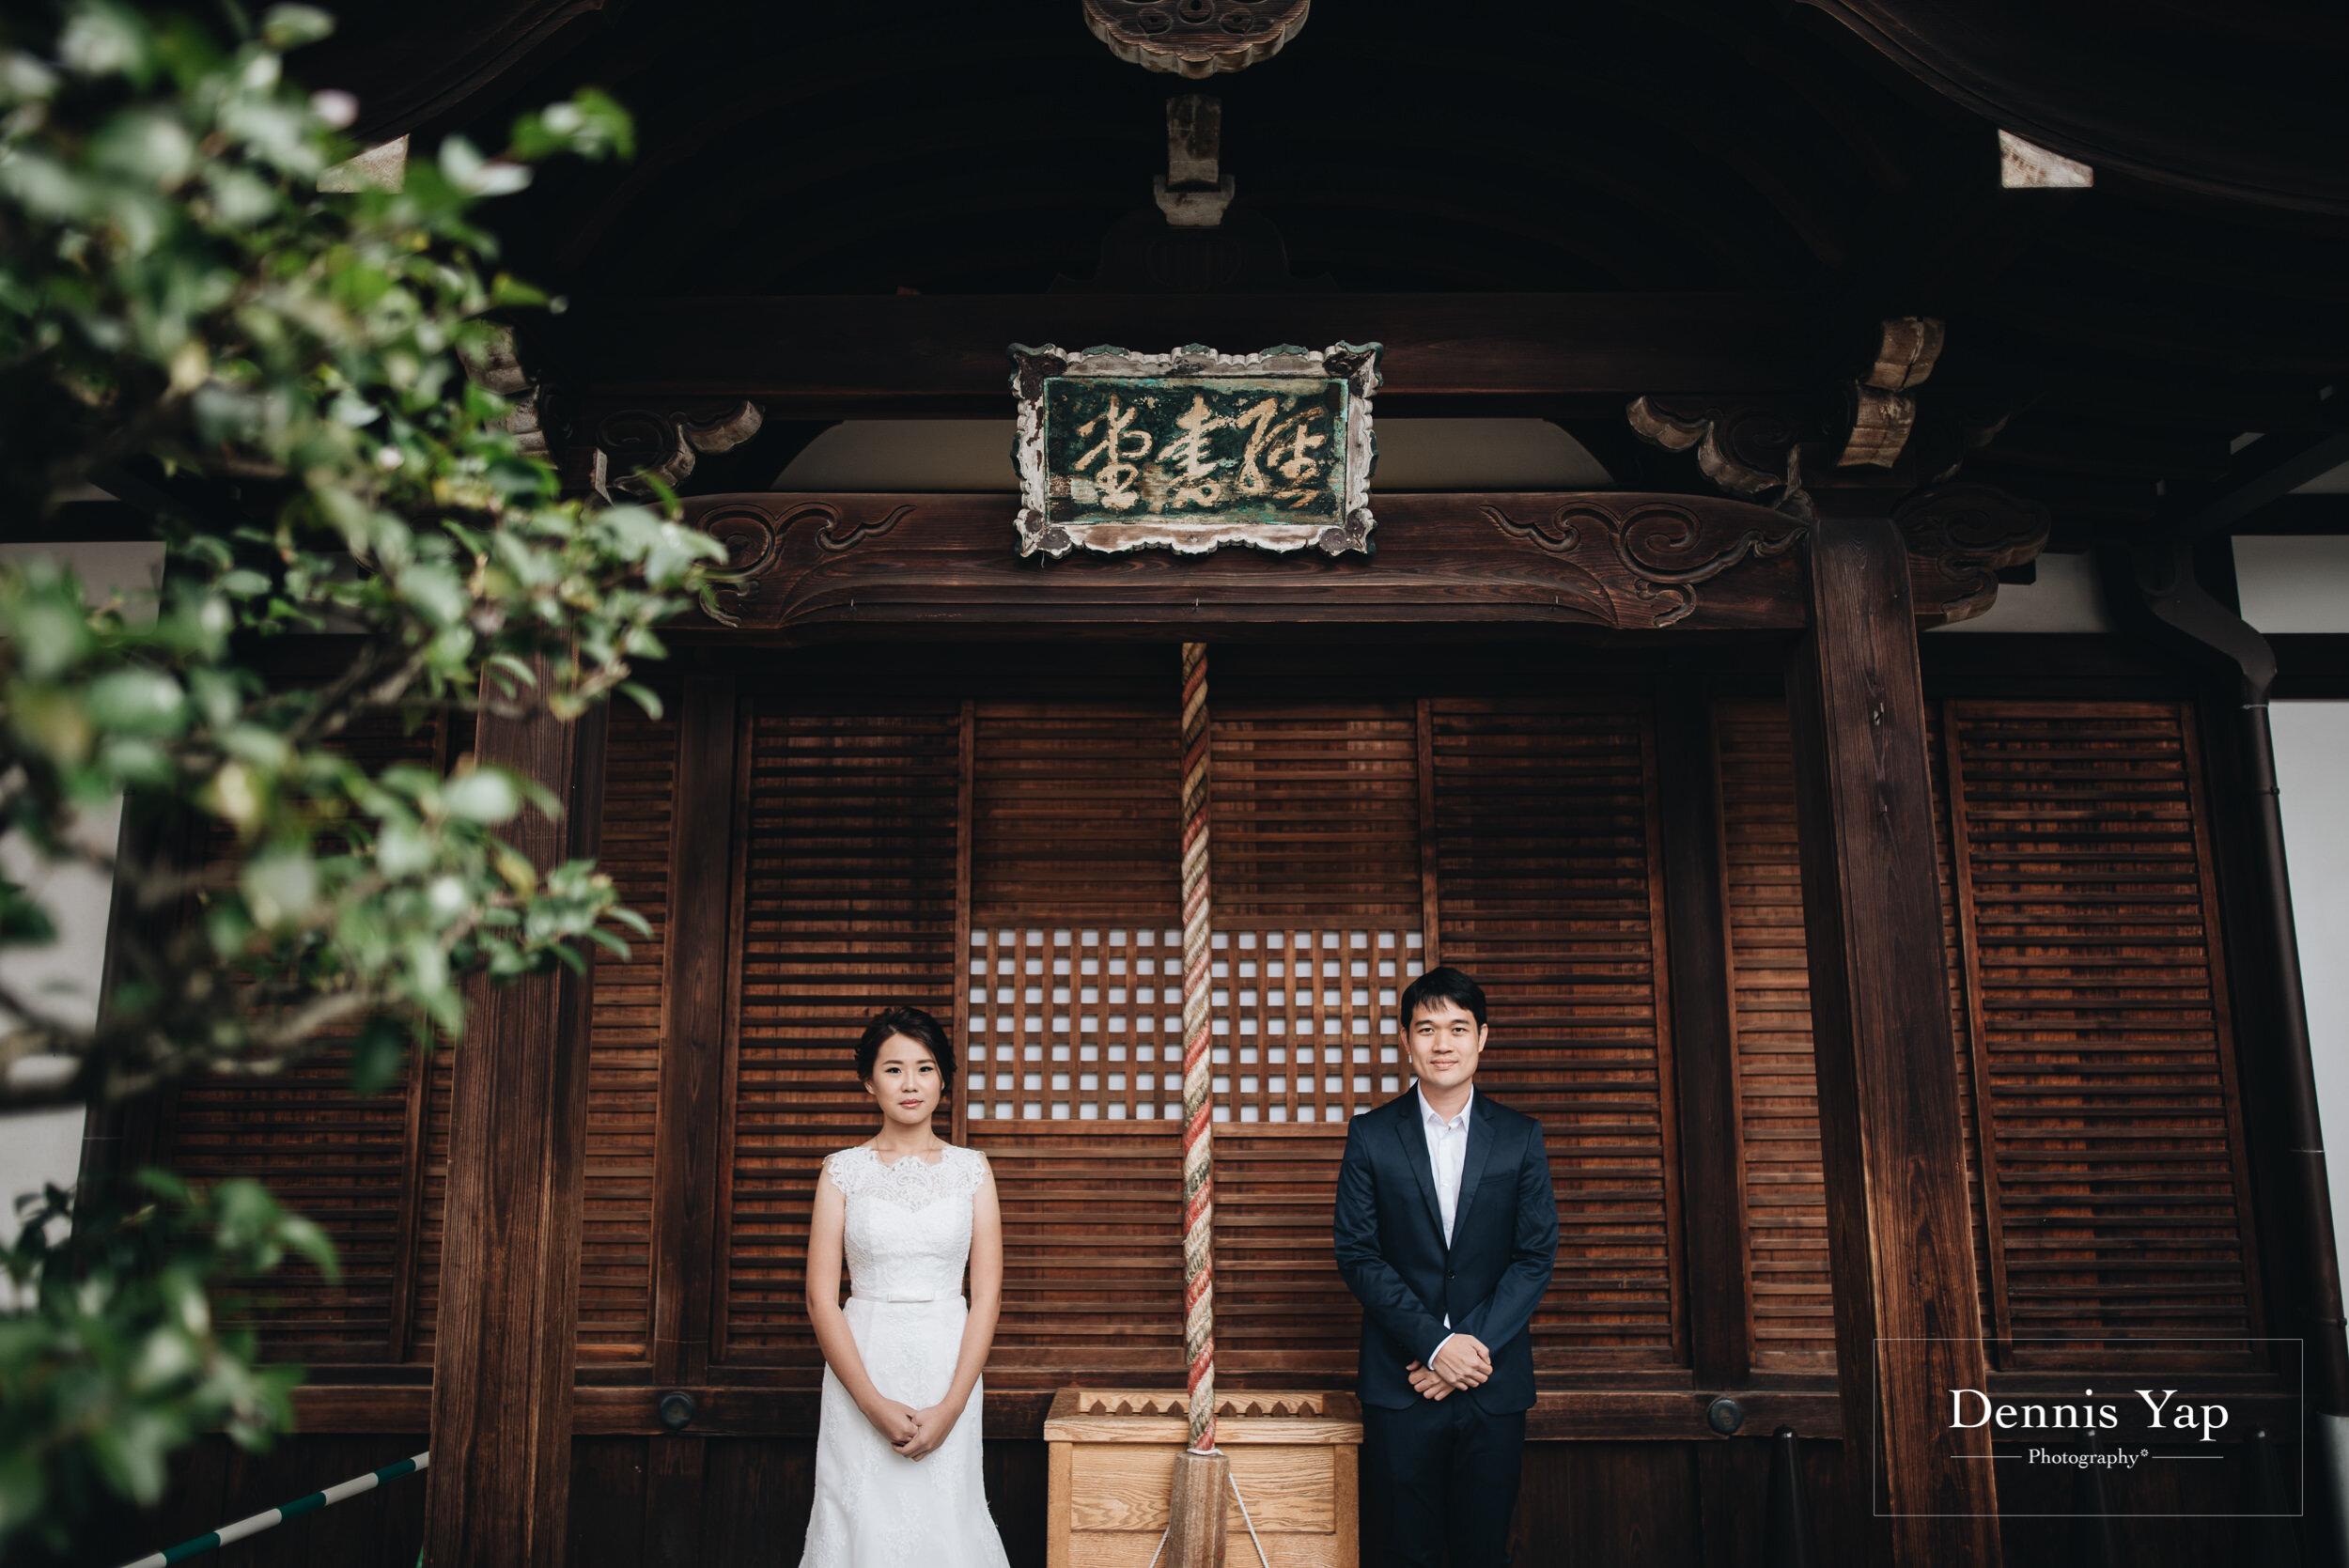 Ivan Glory pre wedding kyoto japan dennis yap photography malaysia top wedding photographer beloved-111.jpg